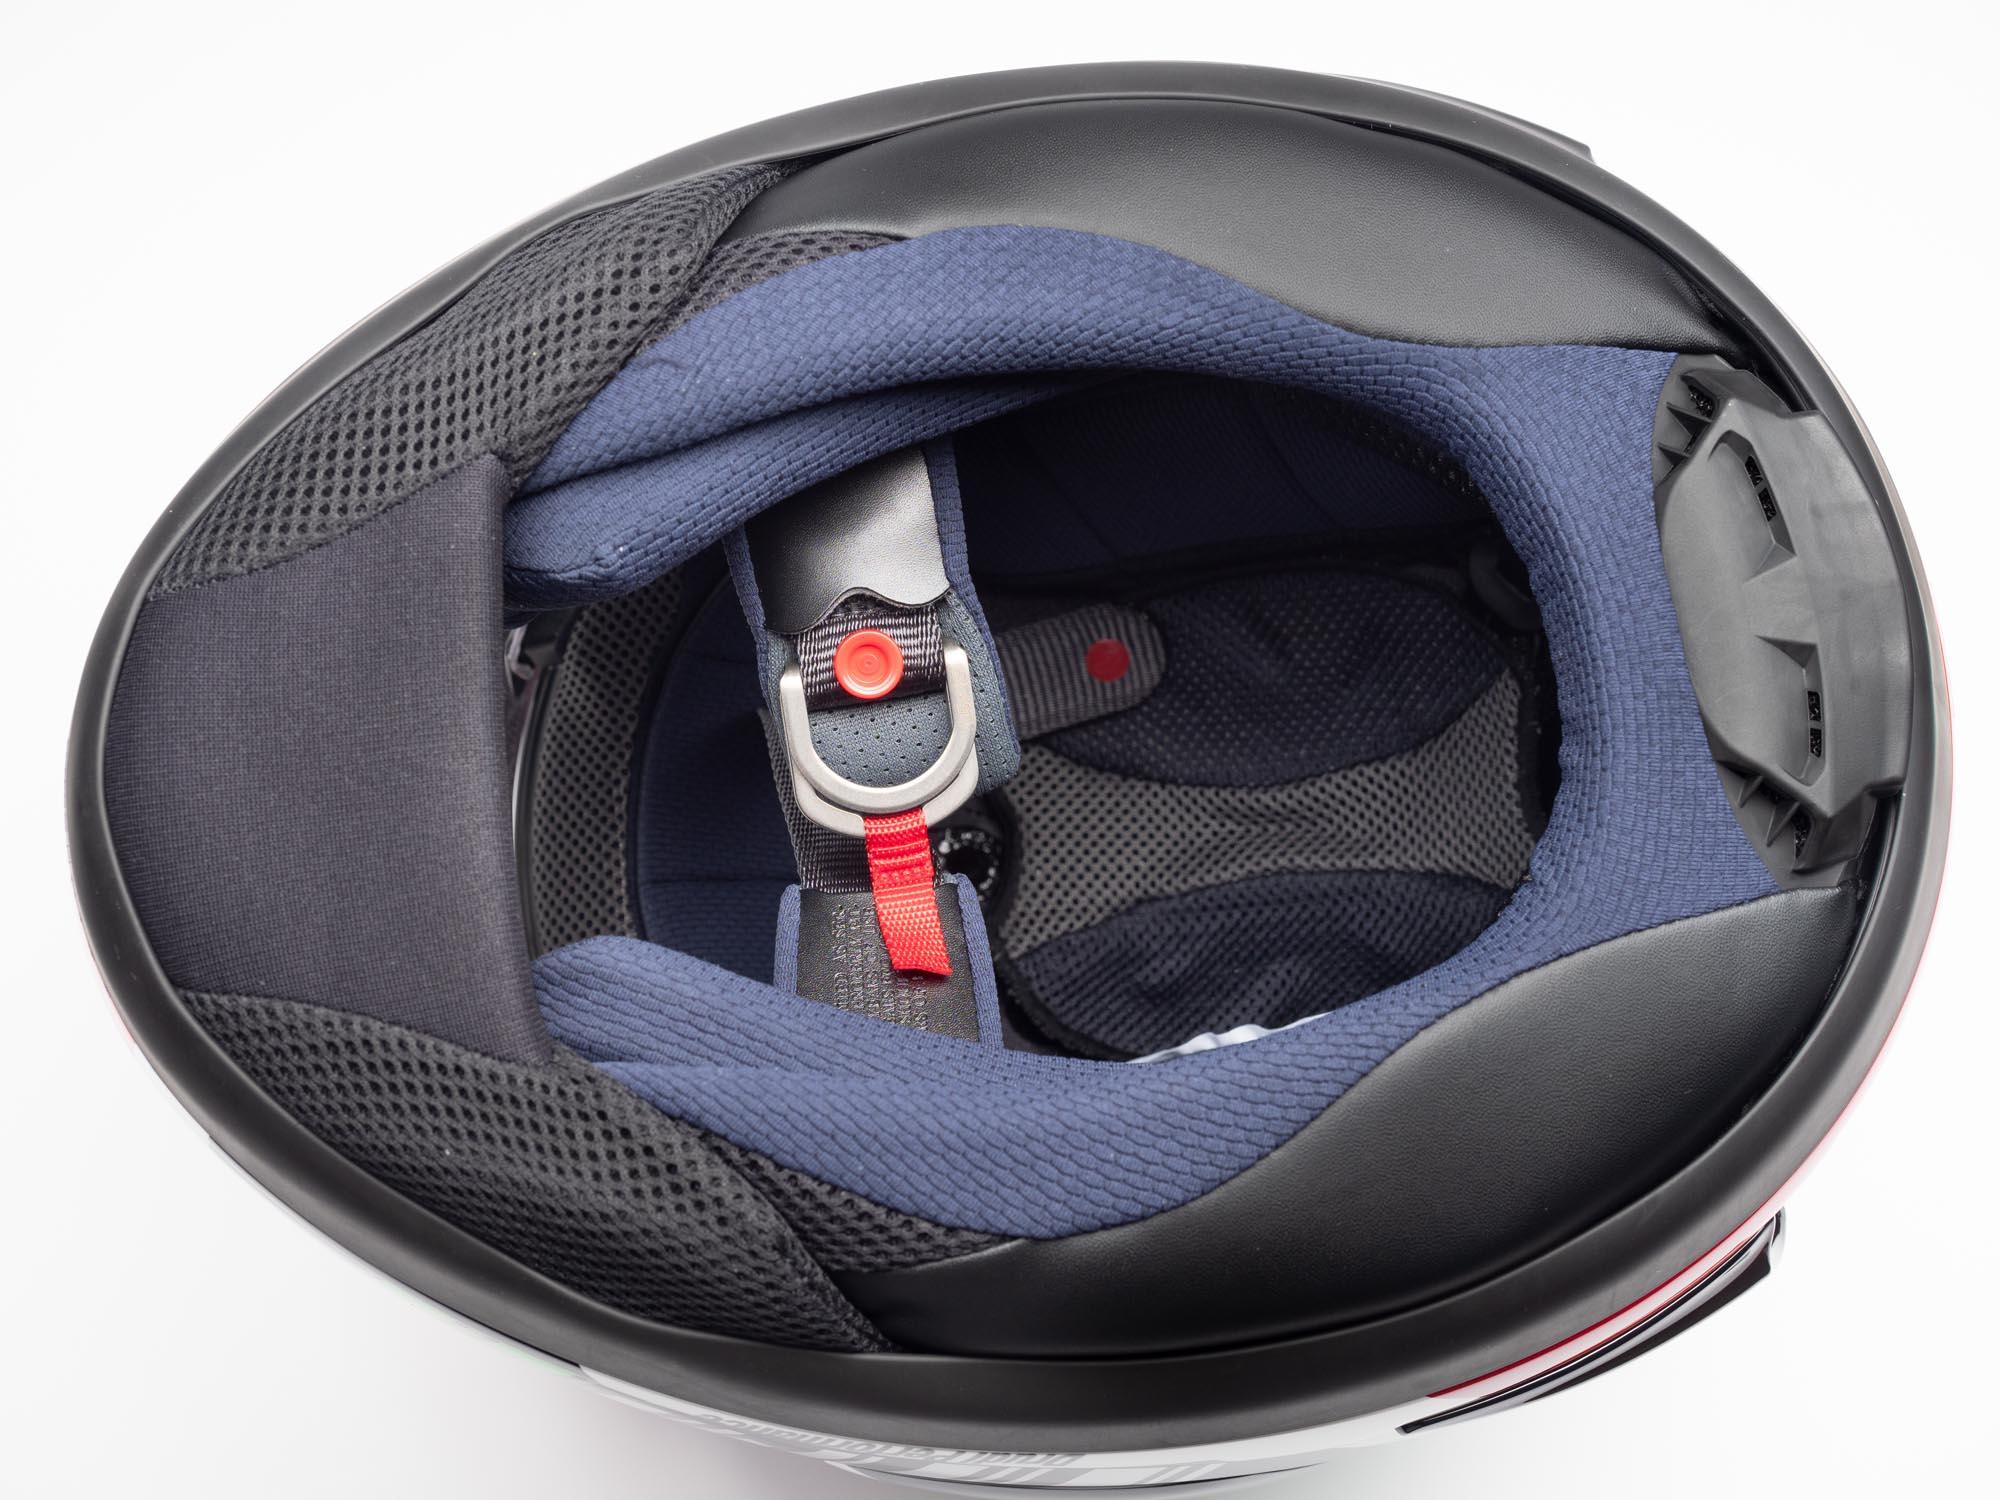 Arai Corsair-X Helmet interior